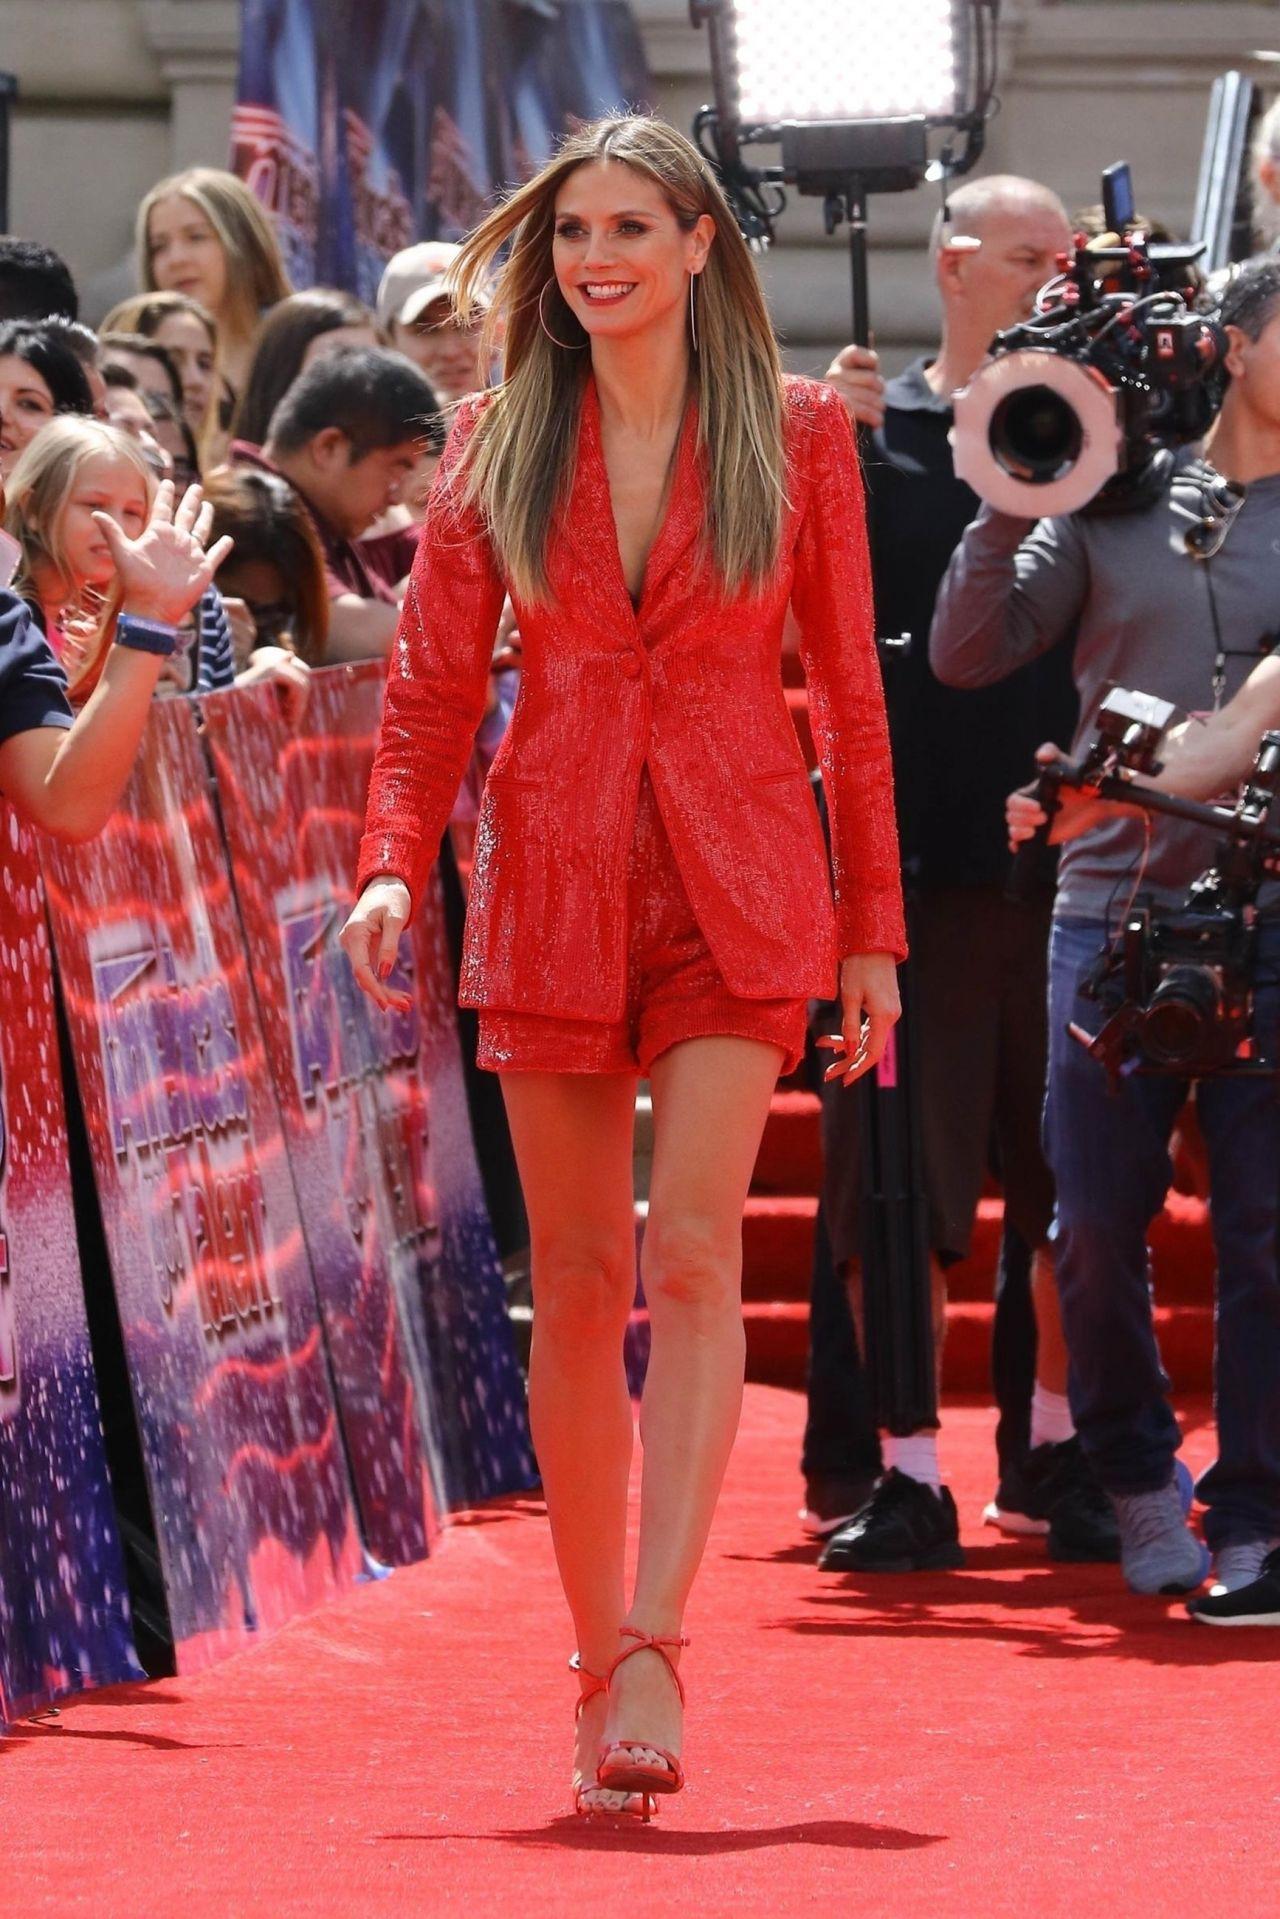 Heidi Klum Arriving At Americas Got Talent In Pasadena